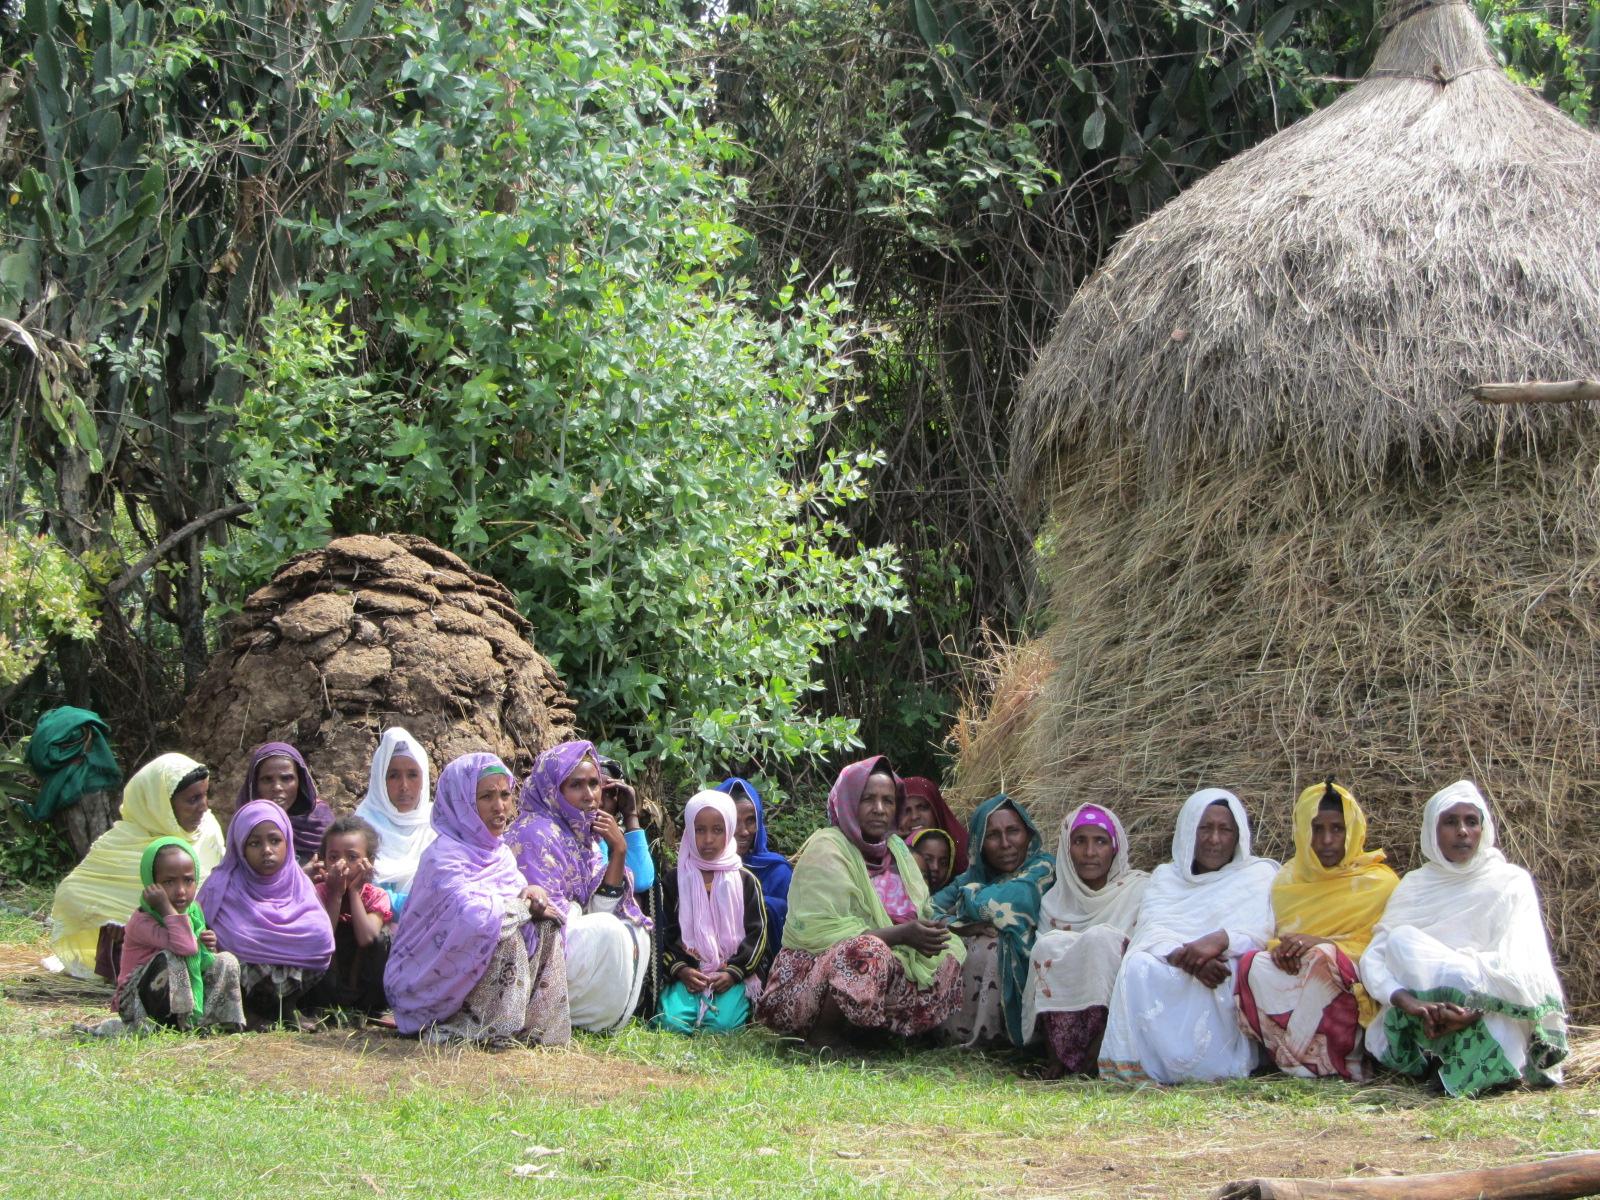 noor dubai foundation joins international coalition for trachoma control 3.jpg